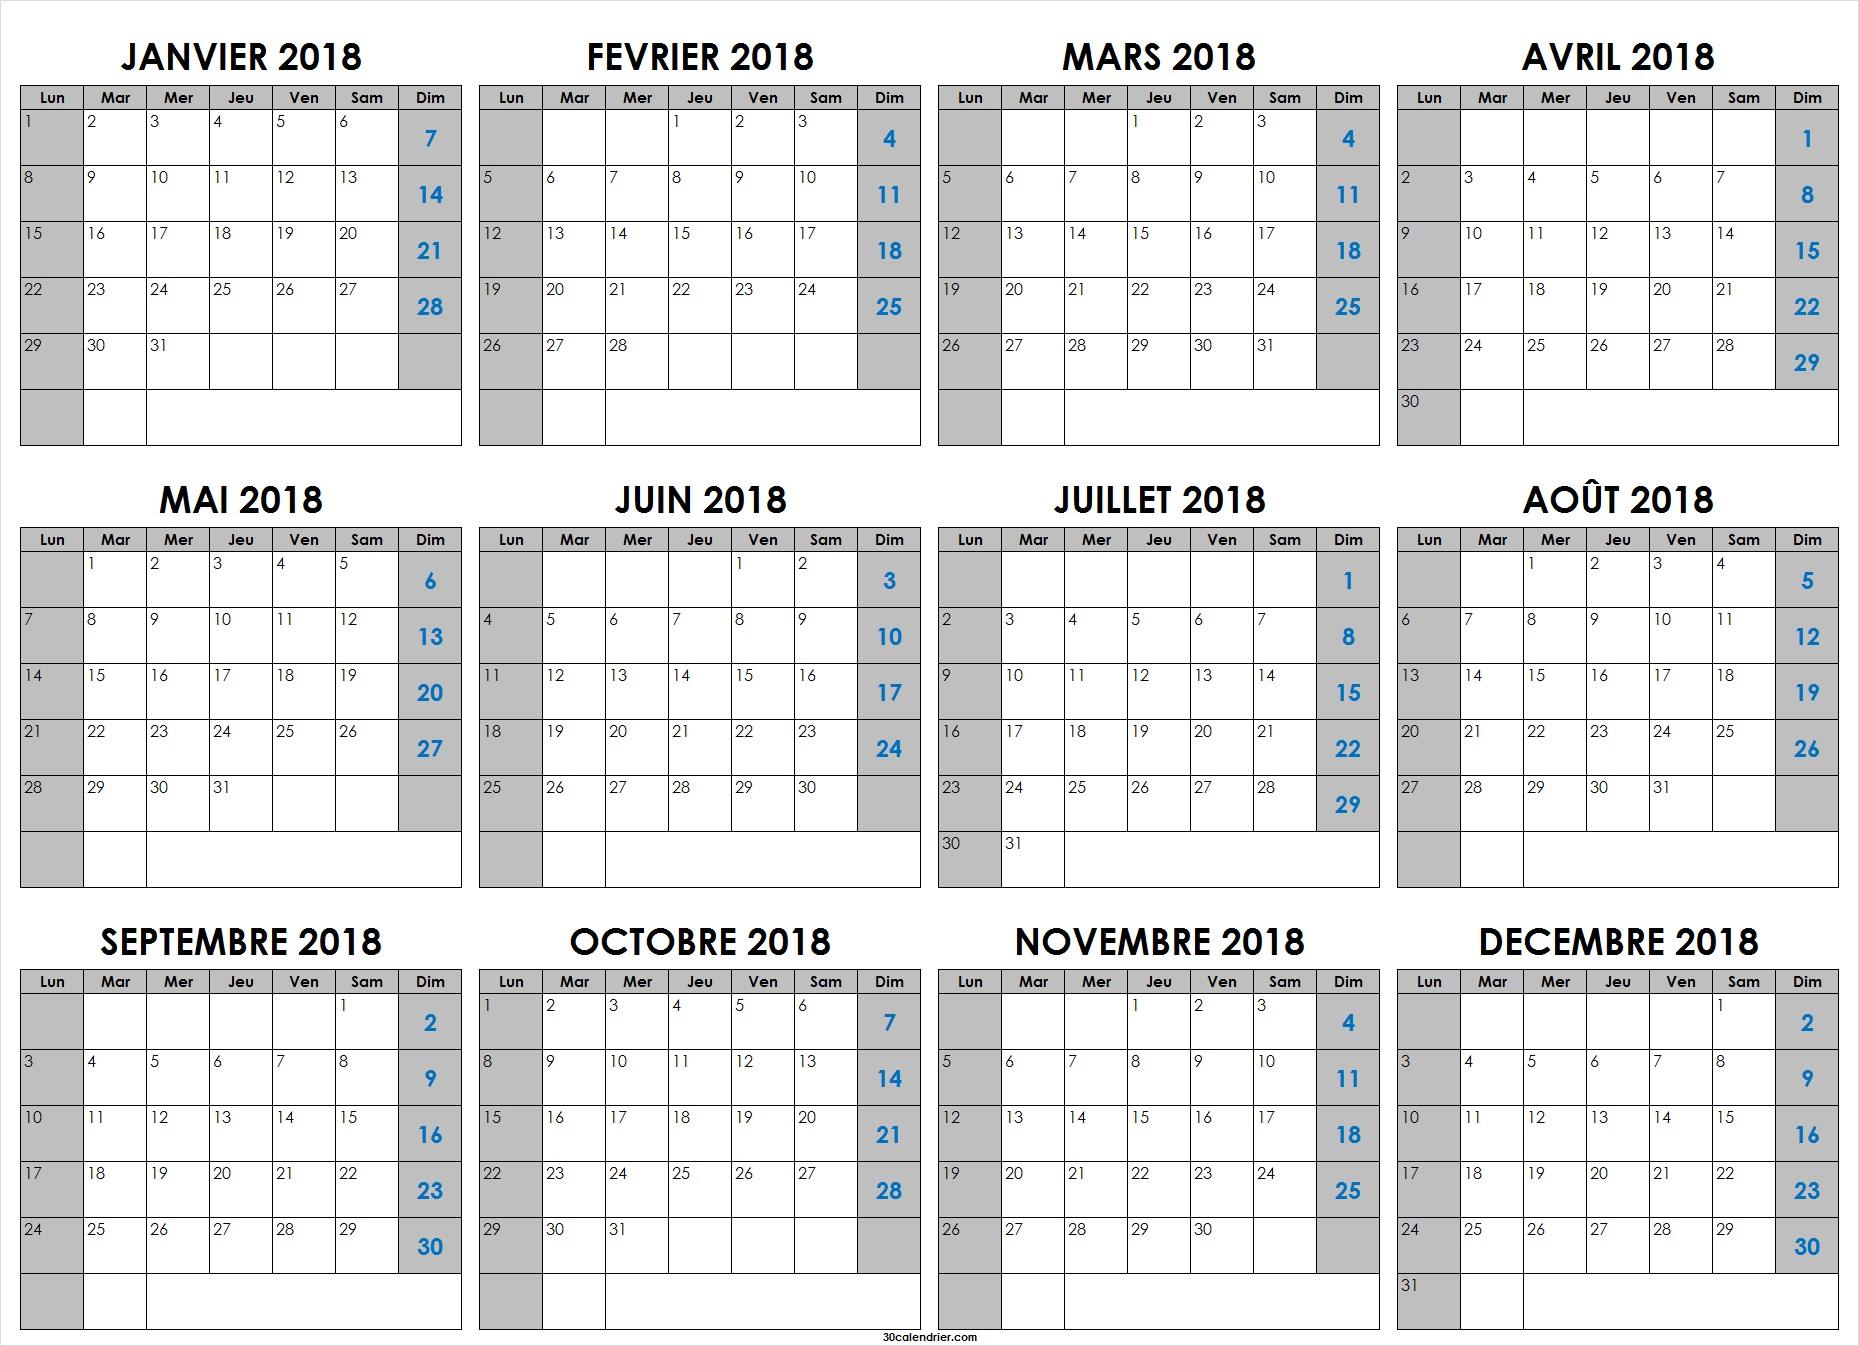 Calendrier 2018 Vierge À Imprimer Mensuel | Calendrier 2018 concernant Calendrier Annuel 2018 À Imprimer